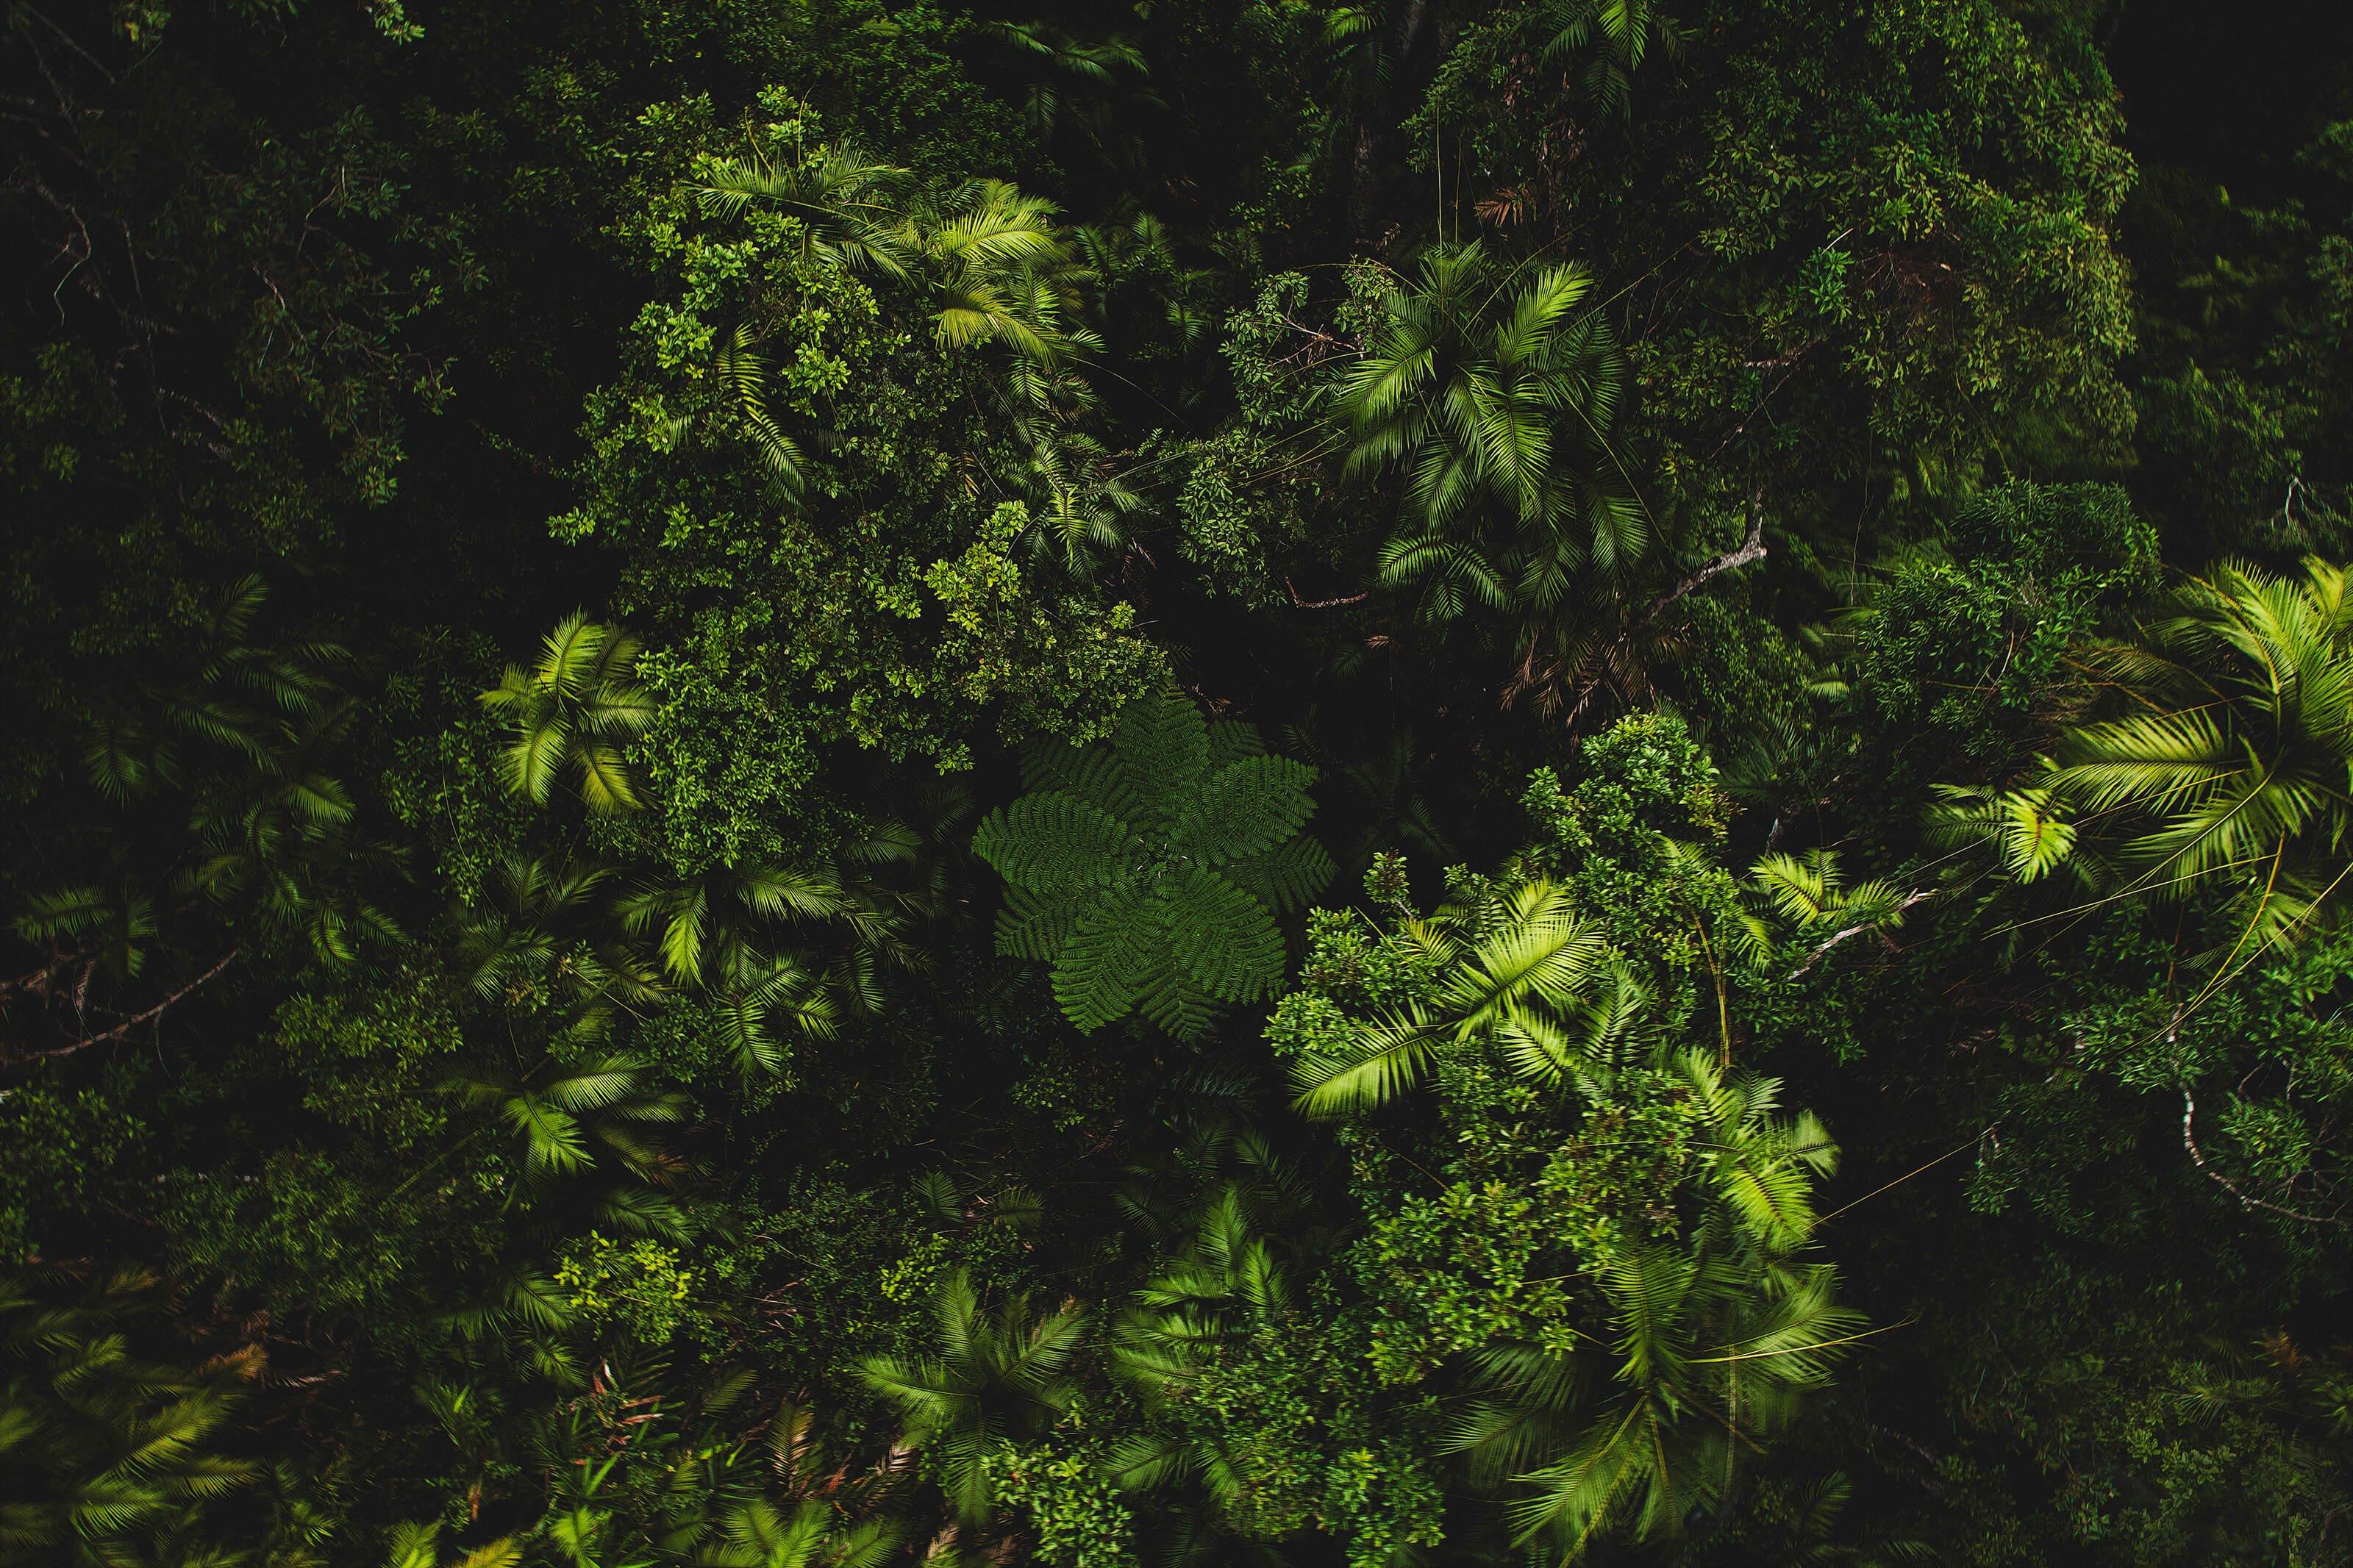 Aerial of Rainforest